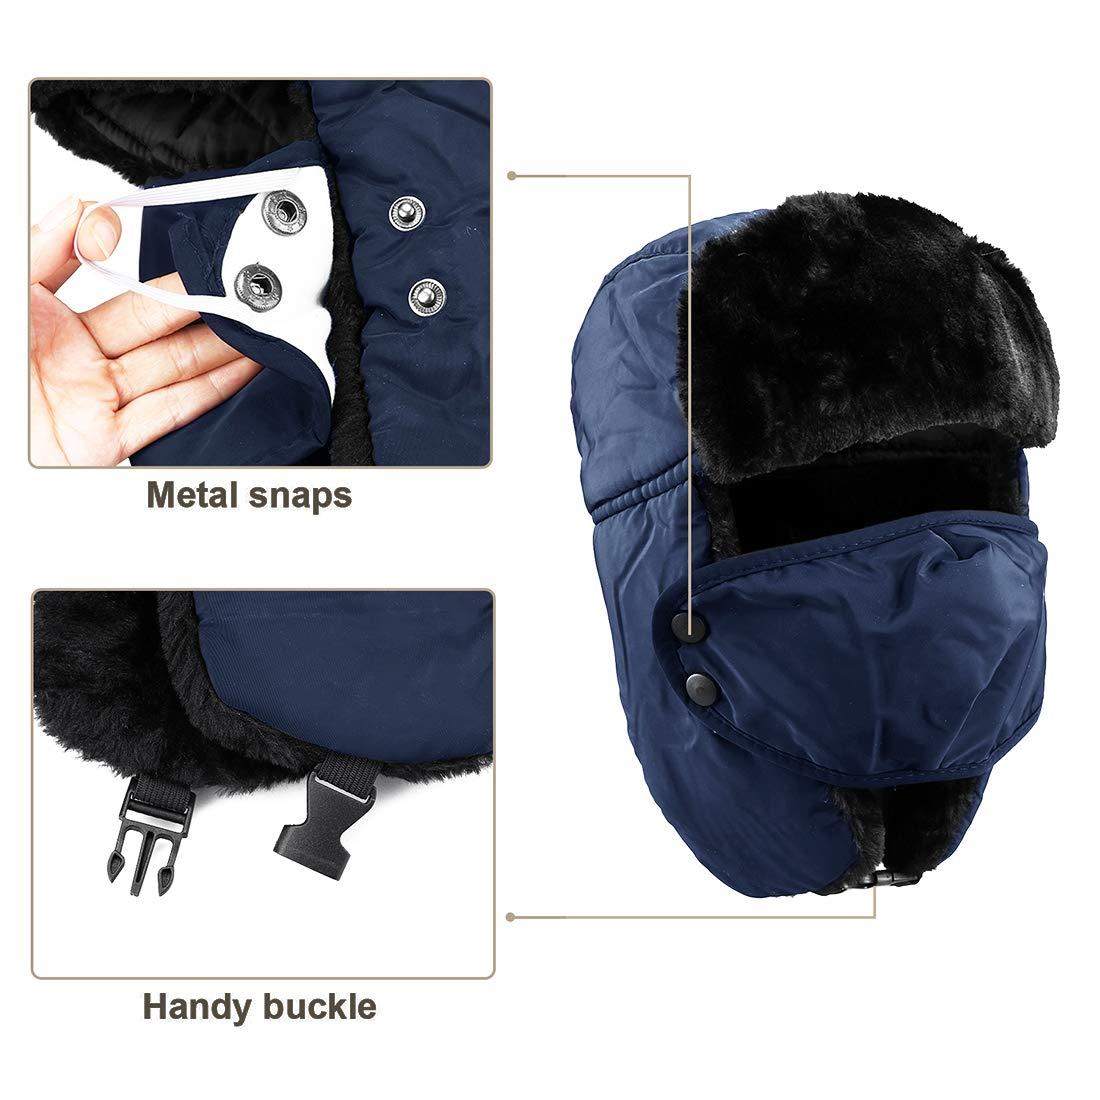 KRATARC Trapper Hat Winter Ski Windproof with Ear Flaps Warm Mask for Men Unisex